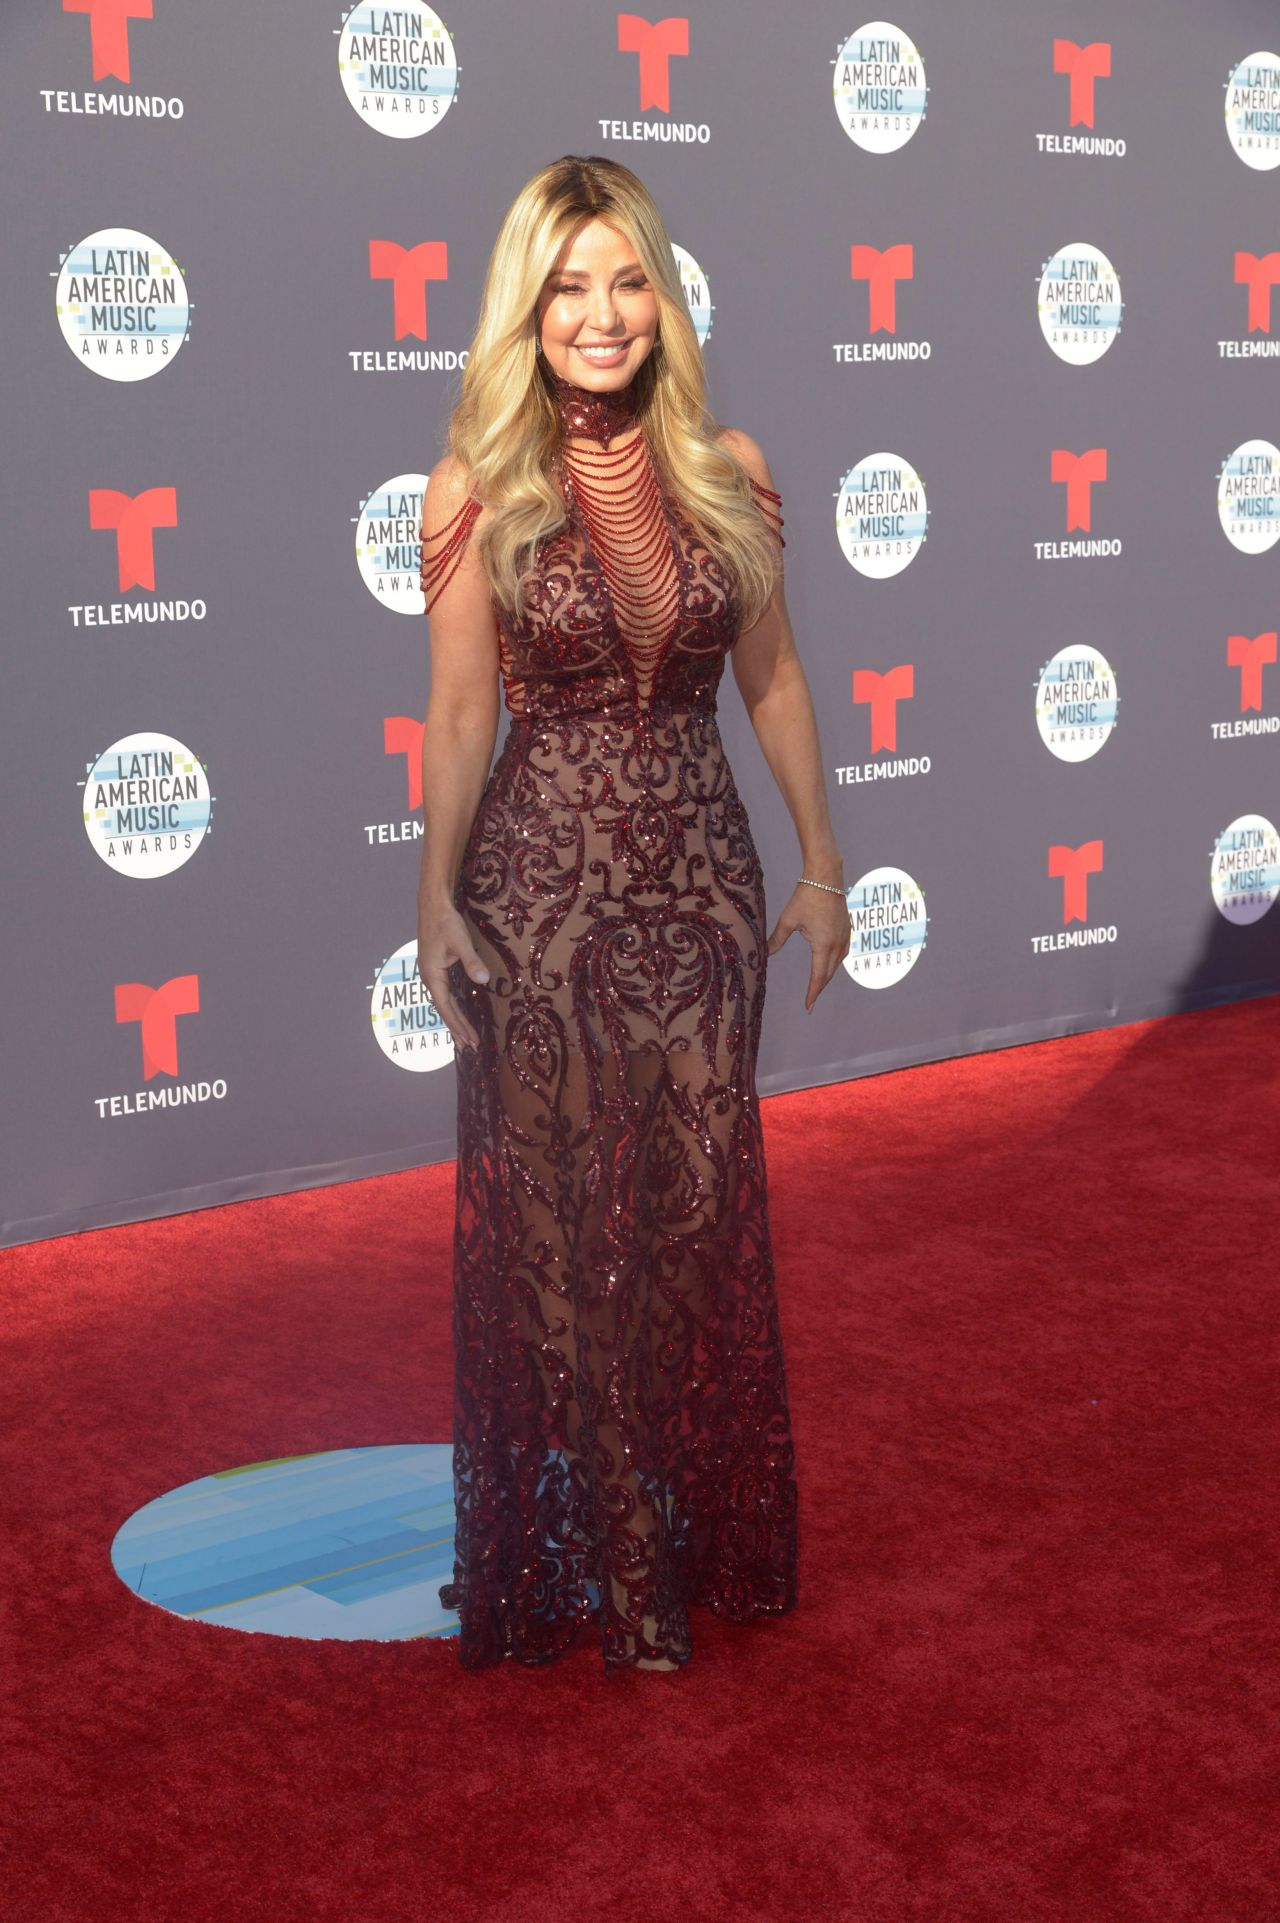 Myrka Dellanos 2018 Latin American